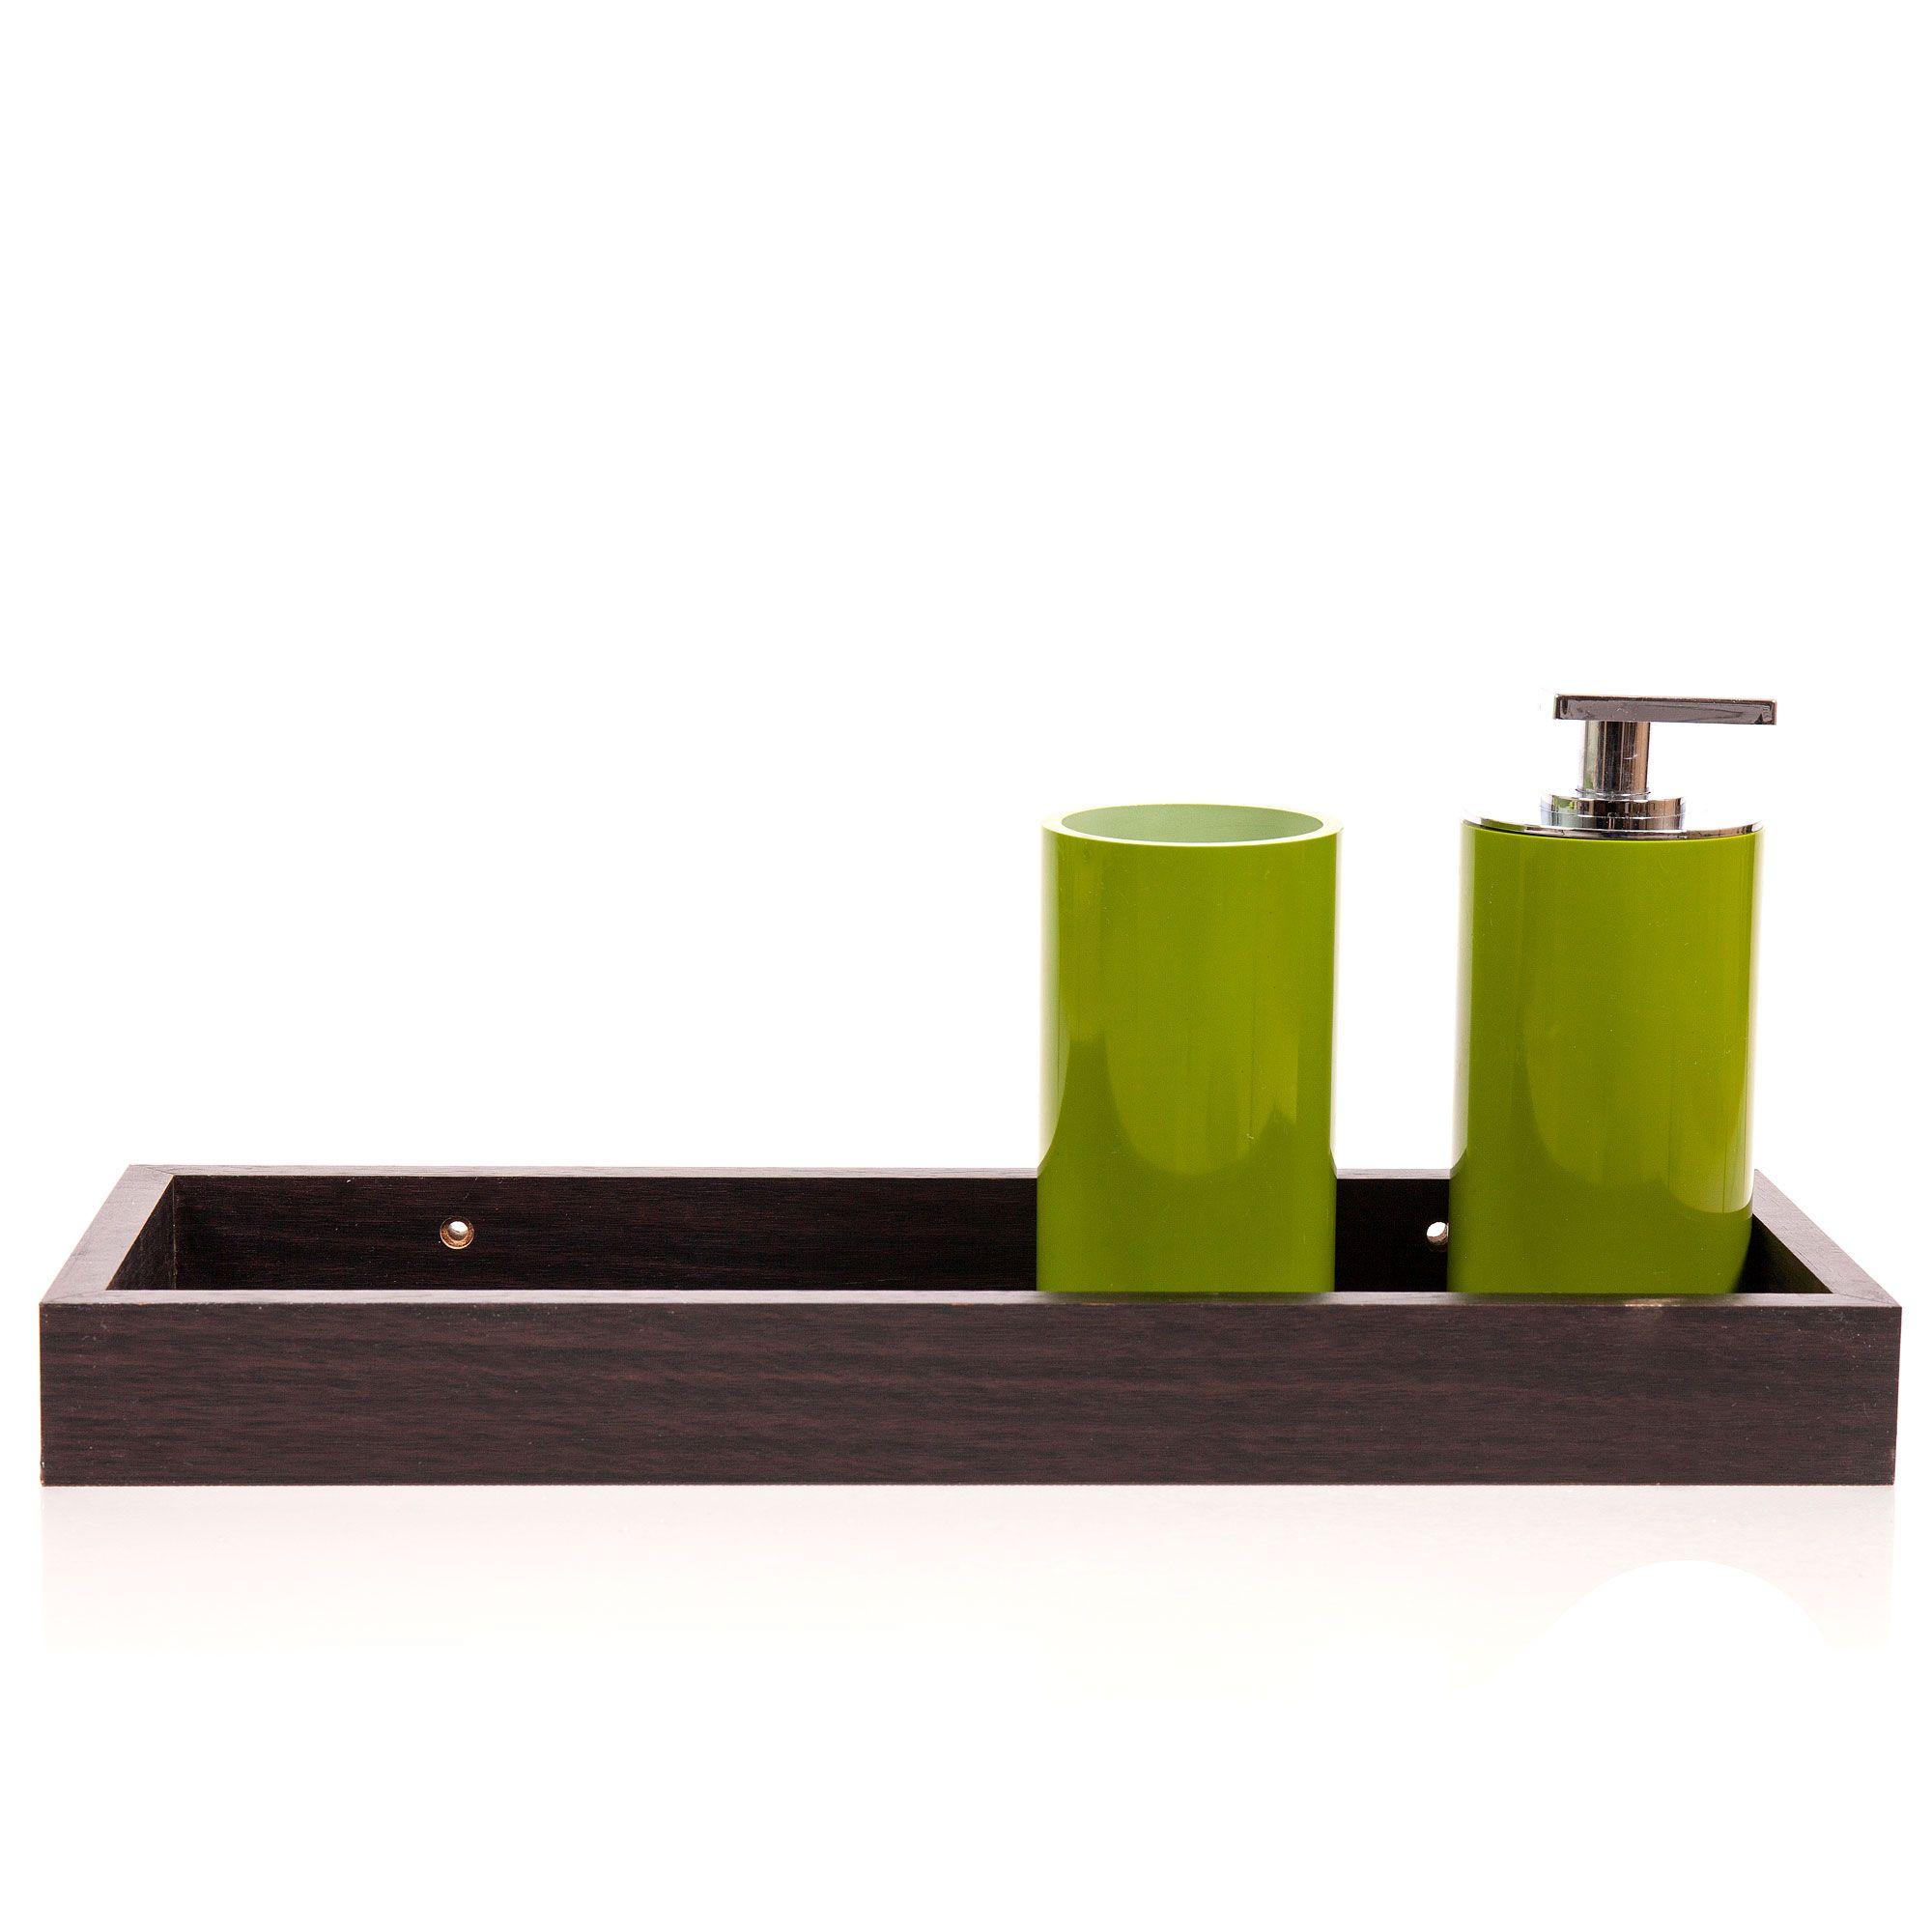 form floating storage wall shelf bedroom wooden display shelving black oak colour blac with drawer tier glass corner unit light grey shelves small kitchen utility cart hidden gun